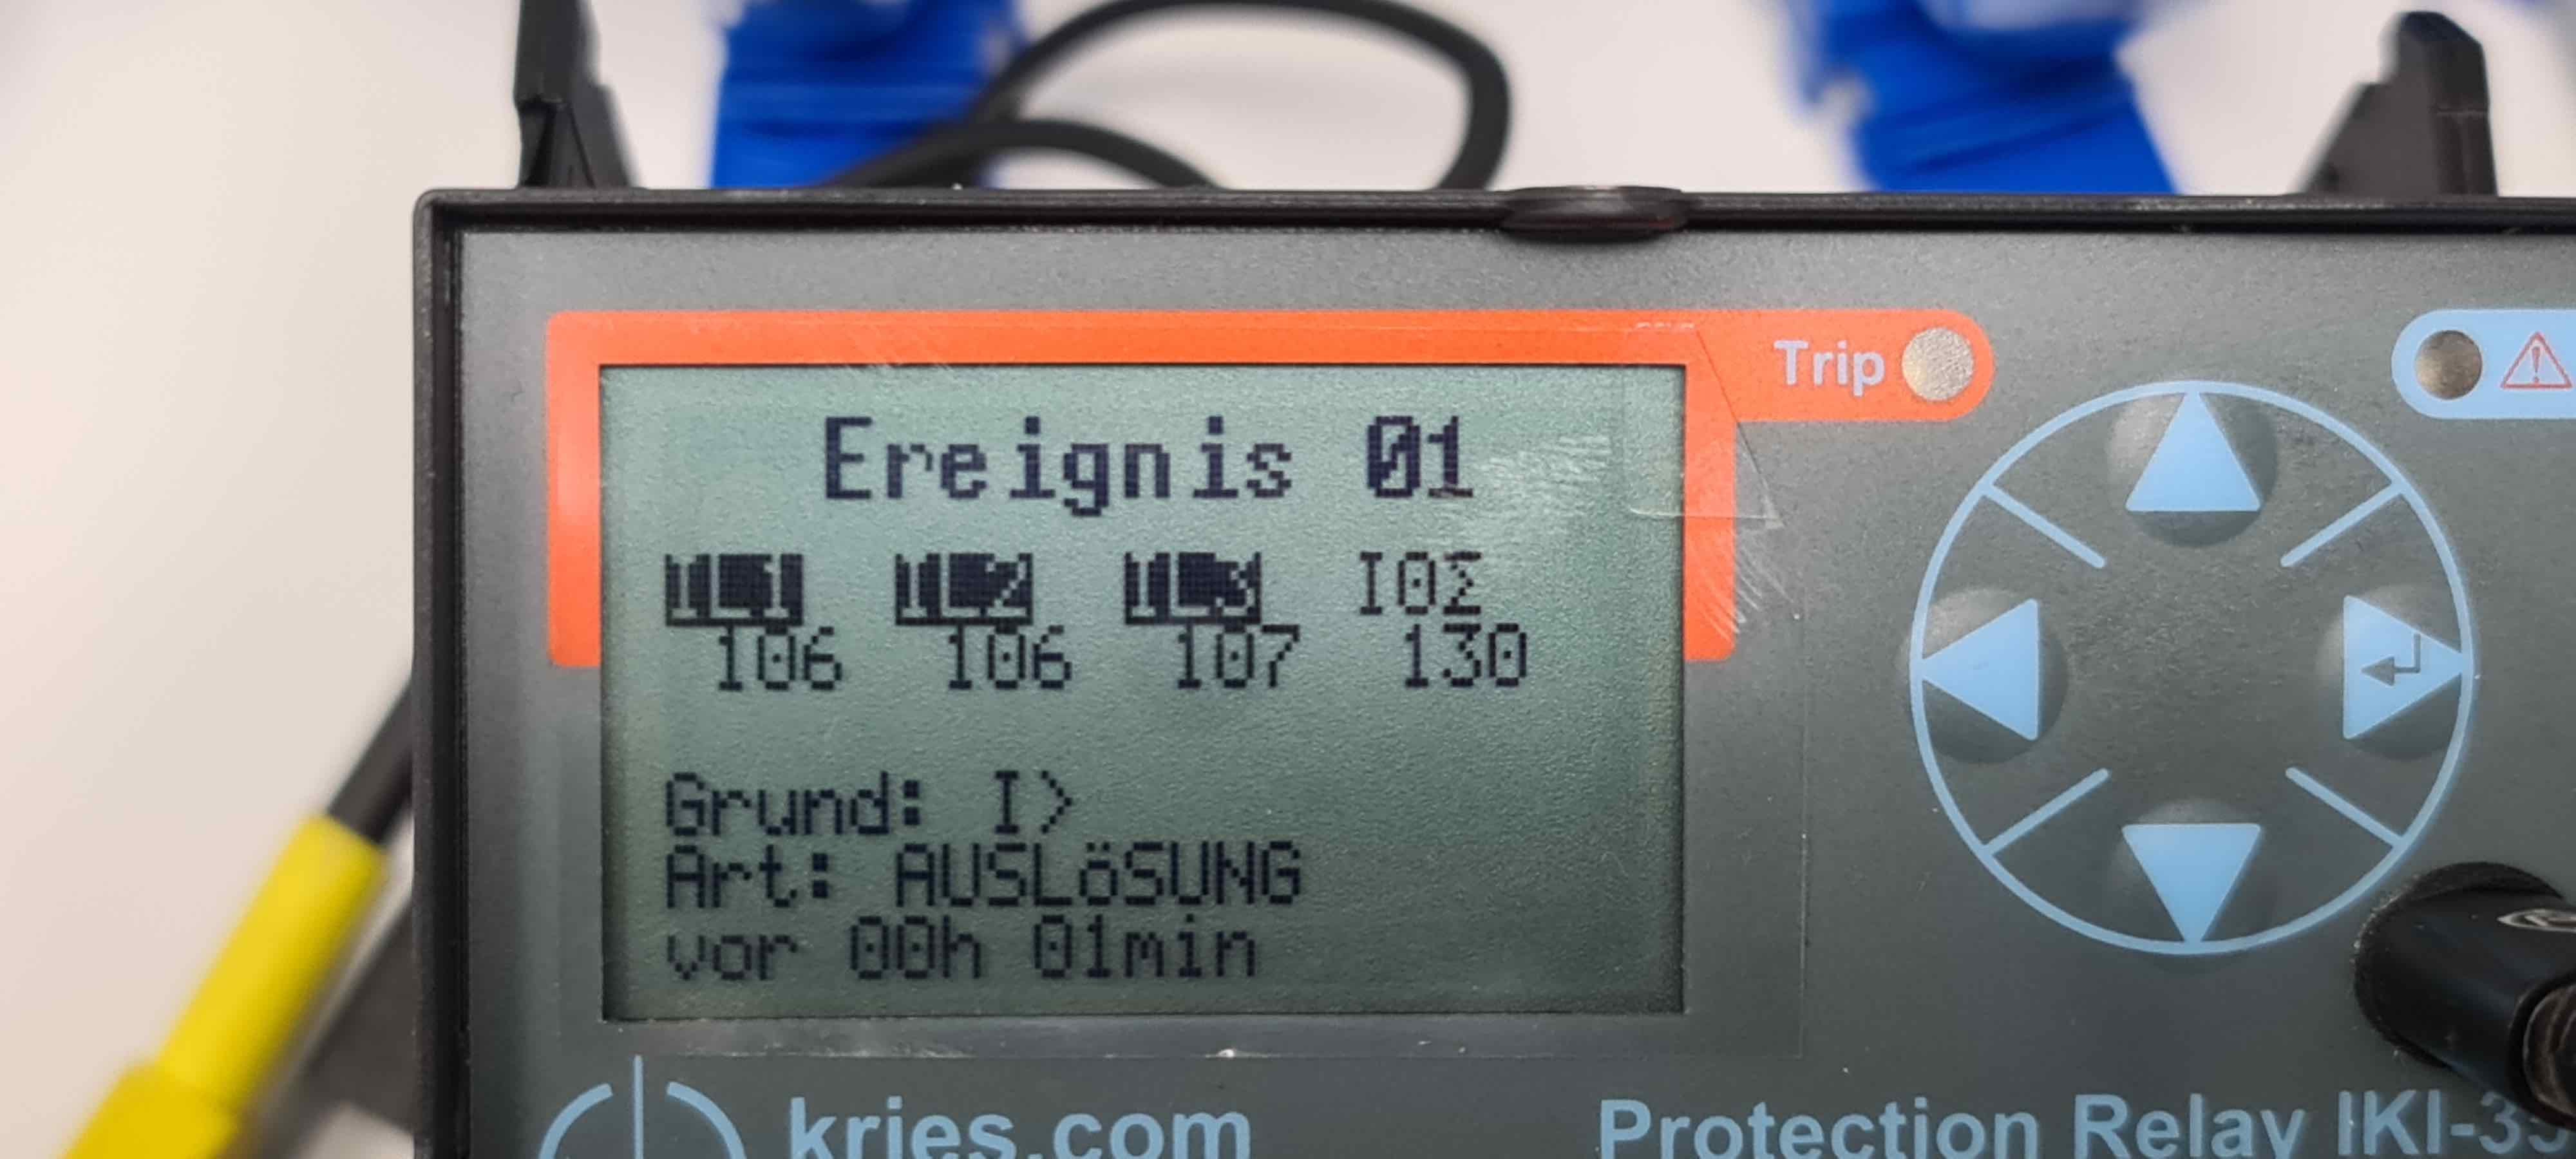 IKI-35, SEG, Kries, Schutzrelais, Erdschlussschutz, Schutzprüfung, Protection Relay, IKI35, IKI-35